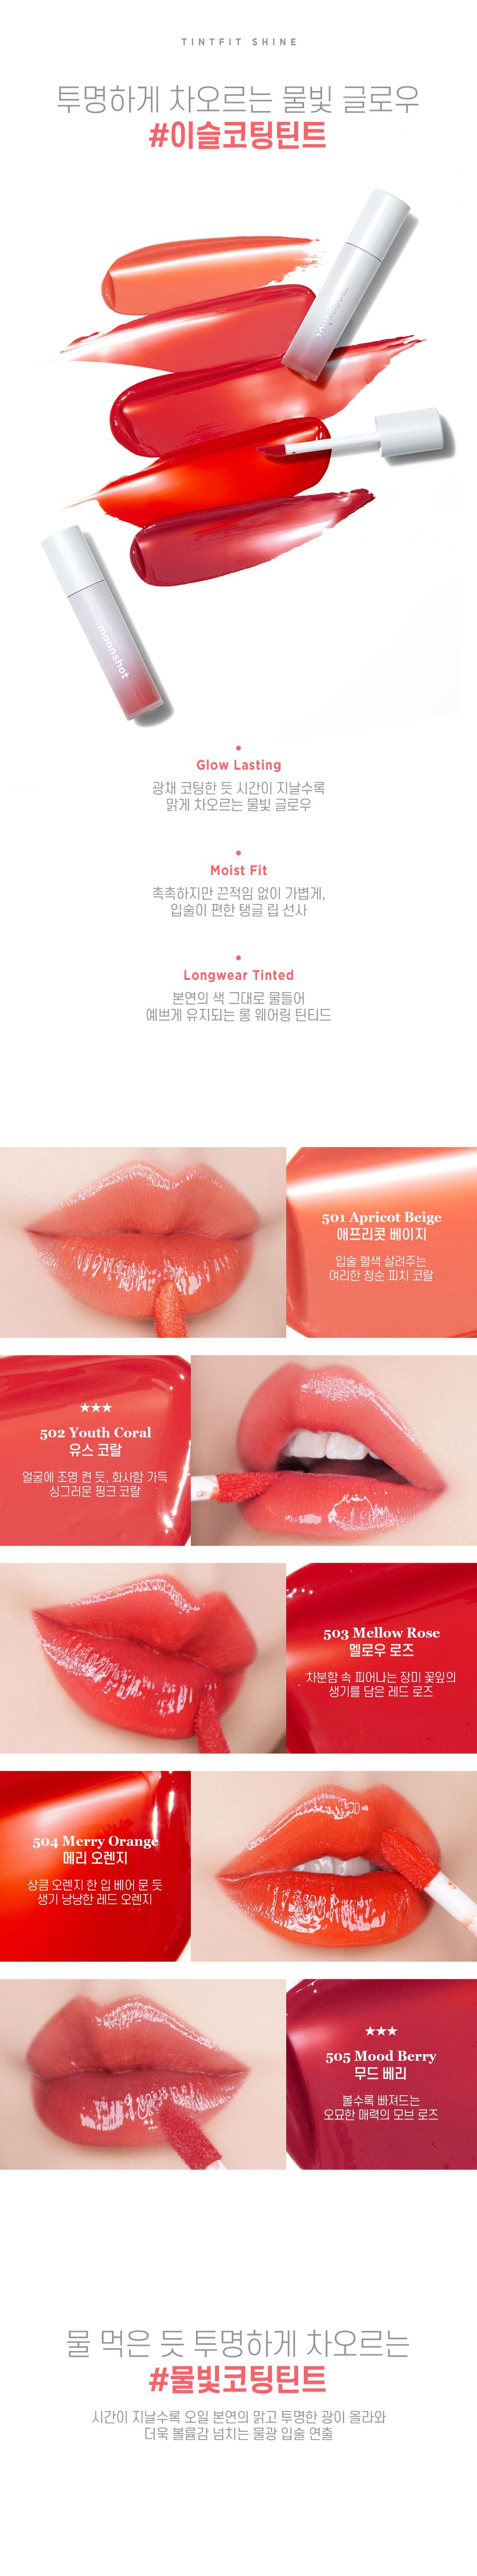 Moonshot Tint Fit Shine korean skincare product online shop malaysia China macau2